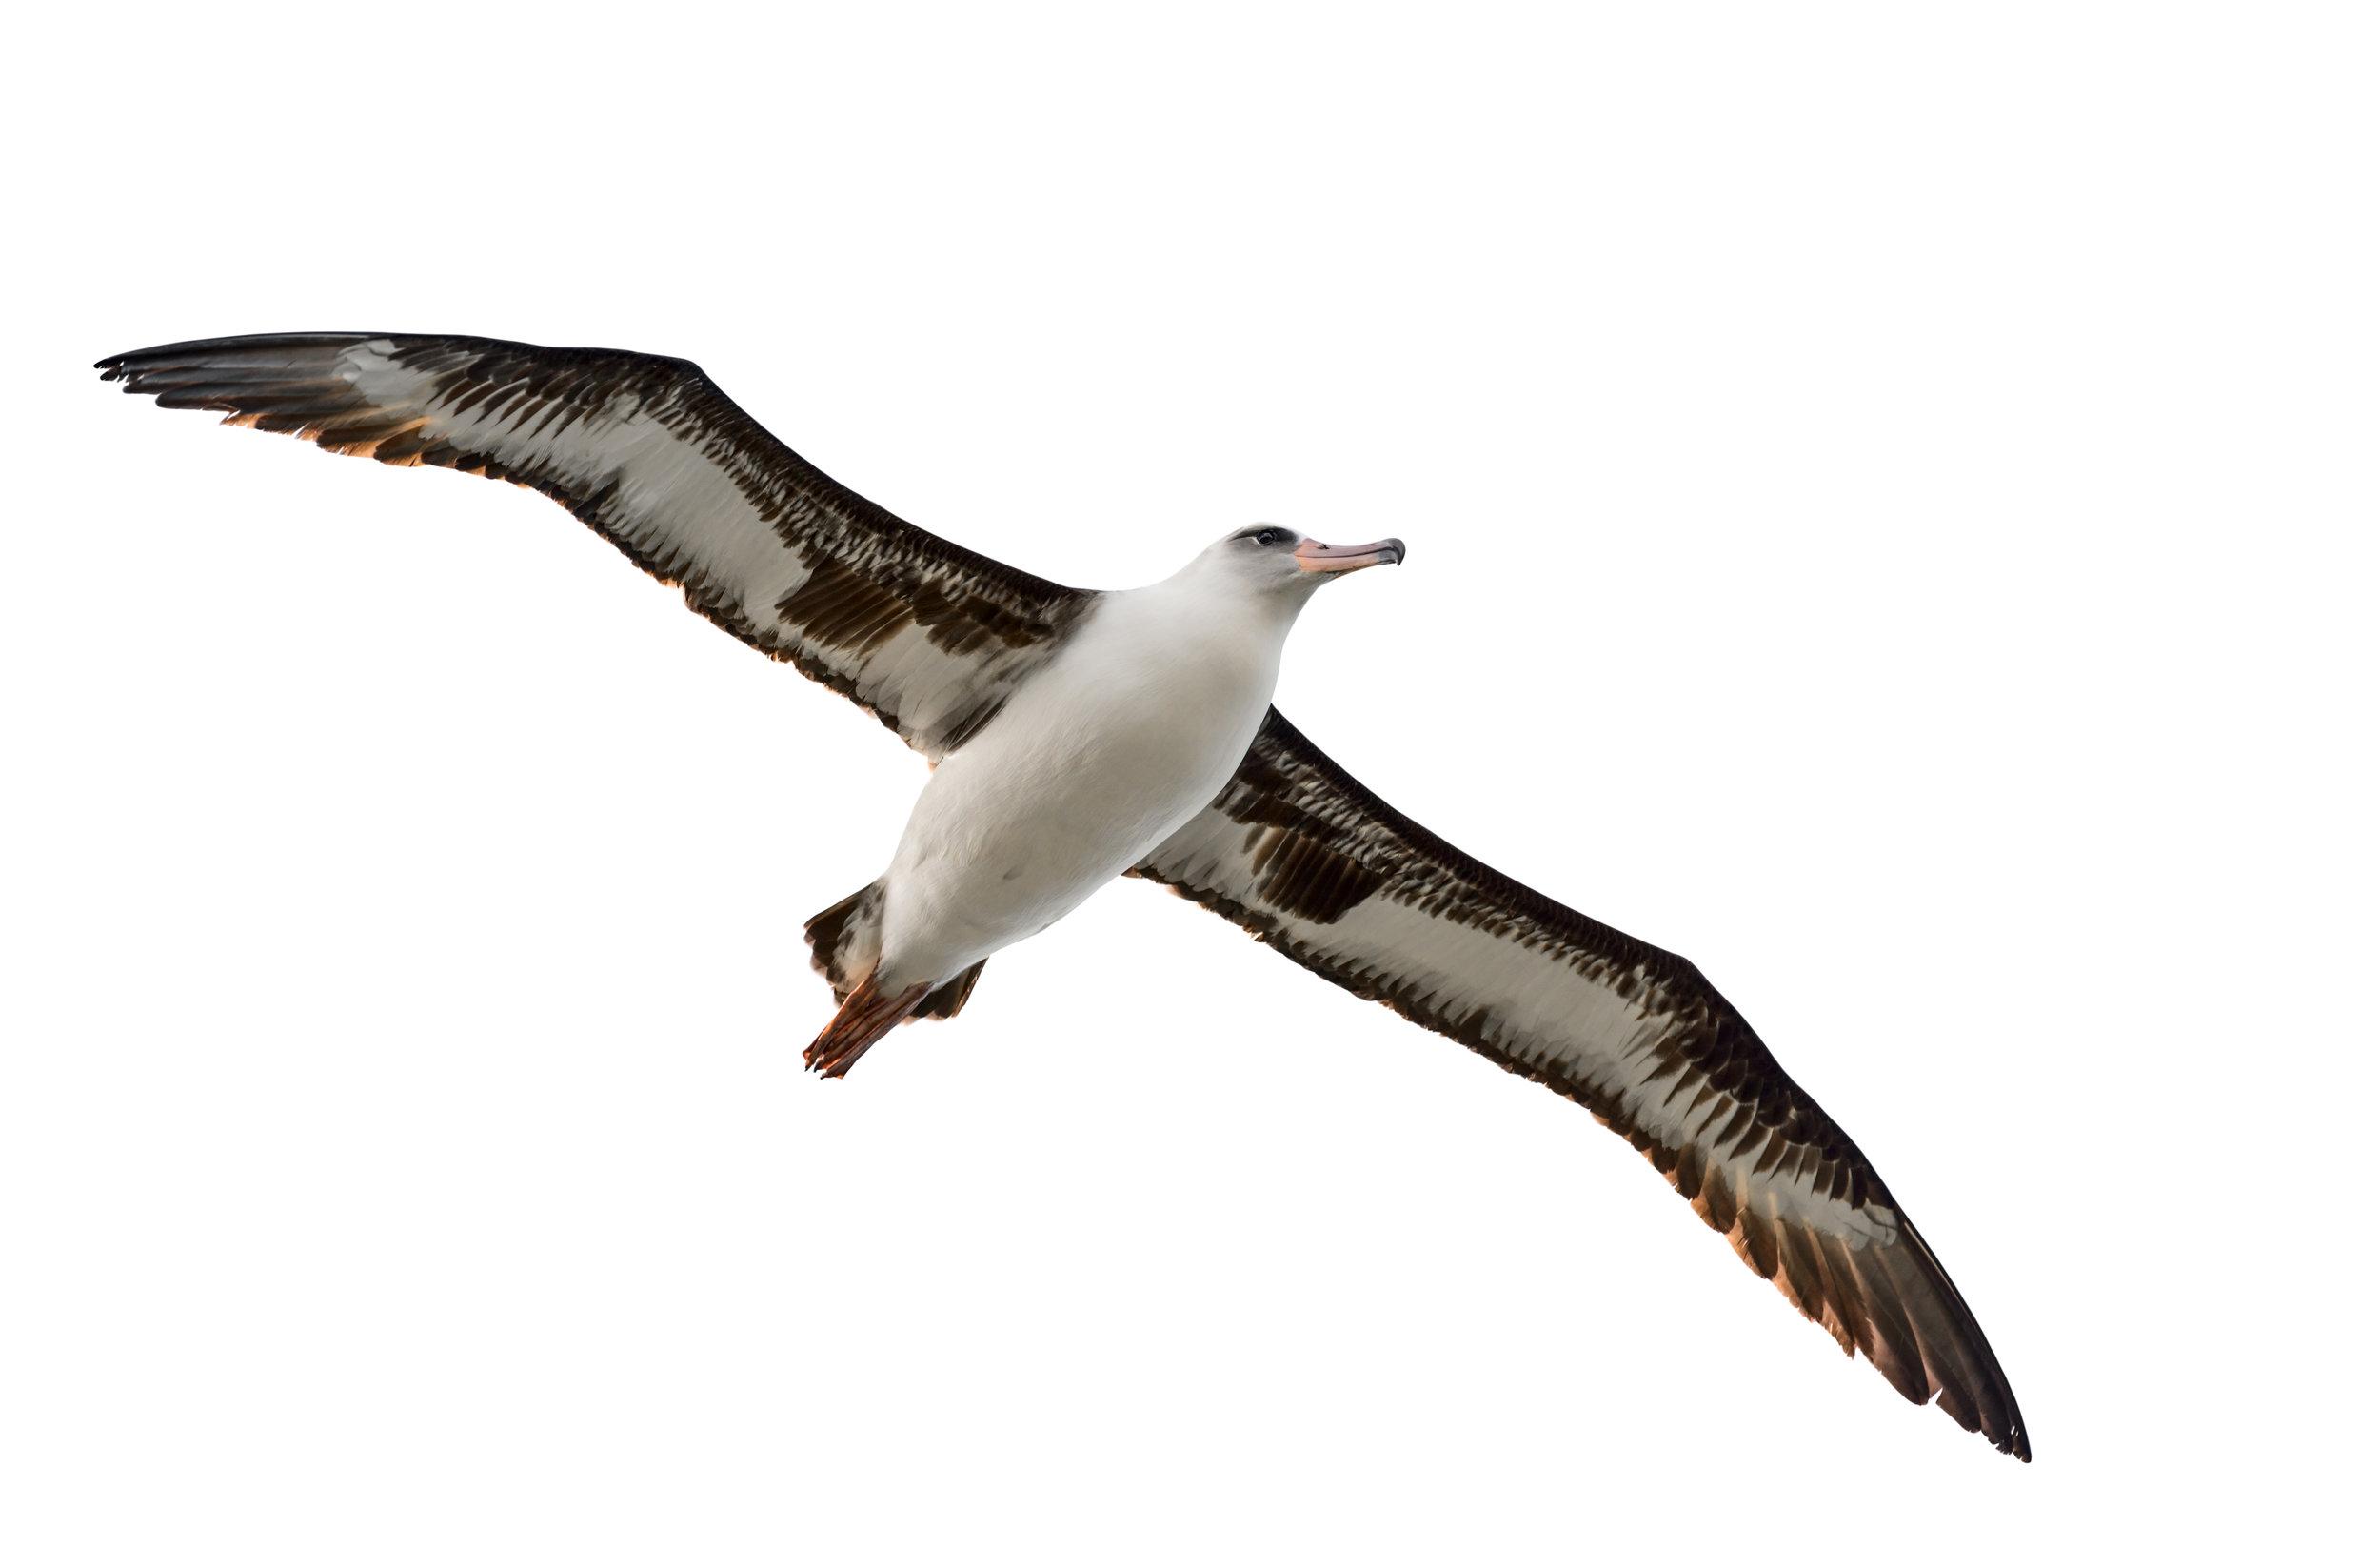 albatross-isolated-on-white-539041989_7740x5024.jpeg